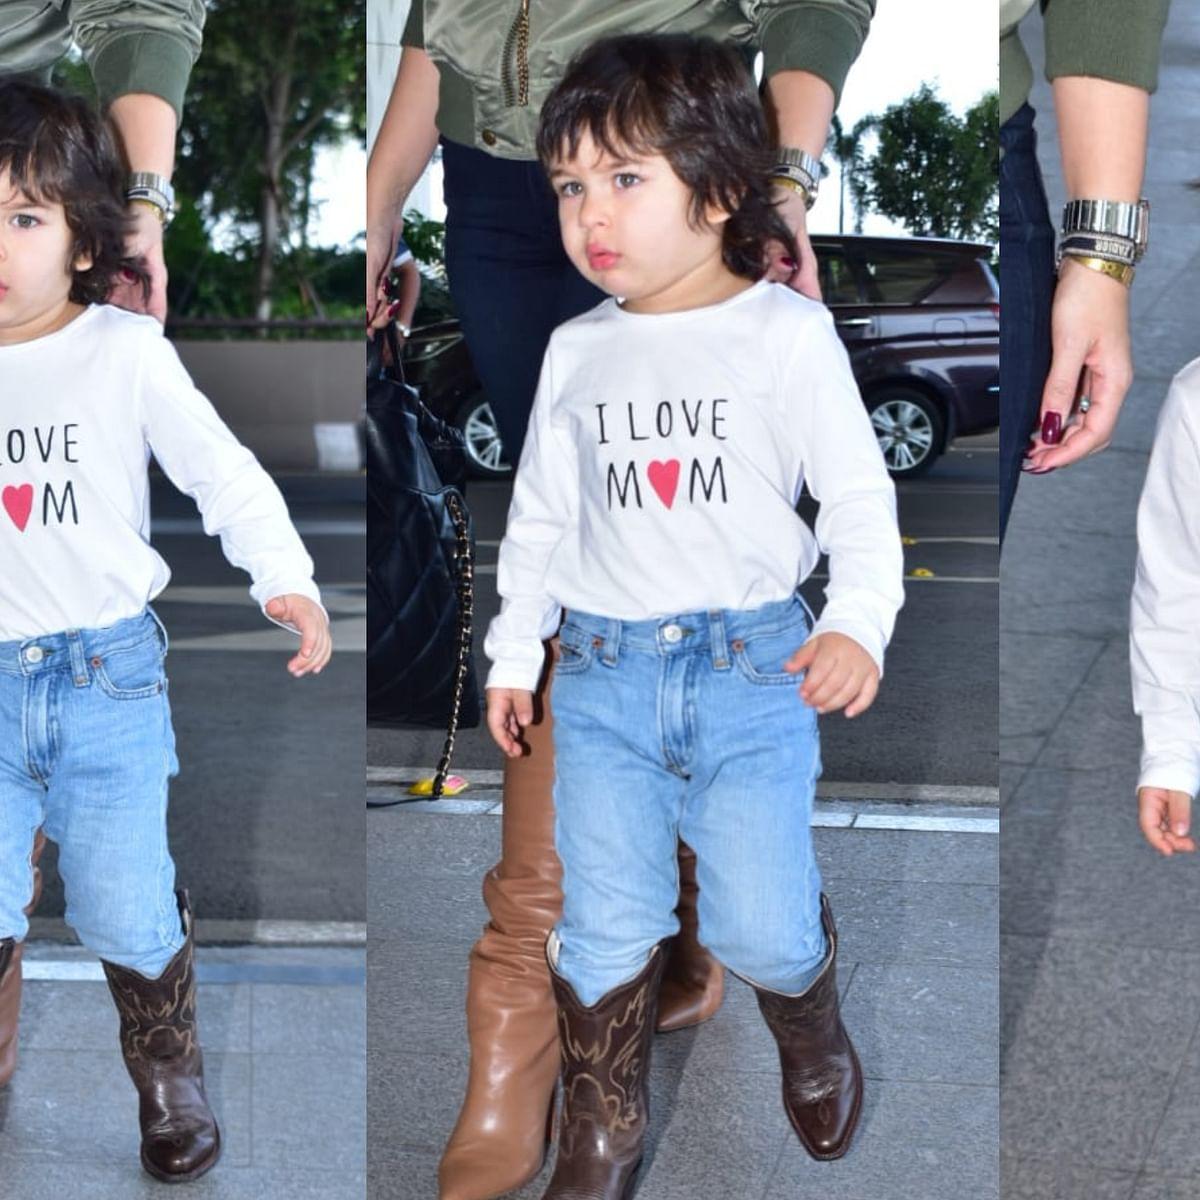 Kareena must be proud as Taimur sports 'I Love Mom' t-shirt on airport